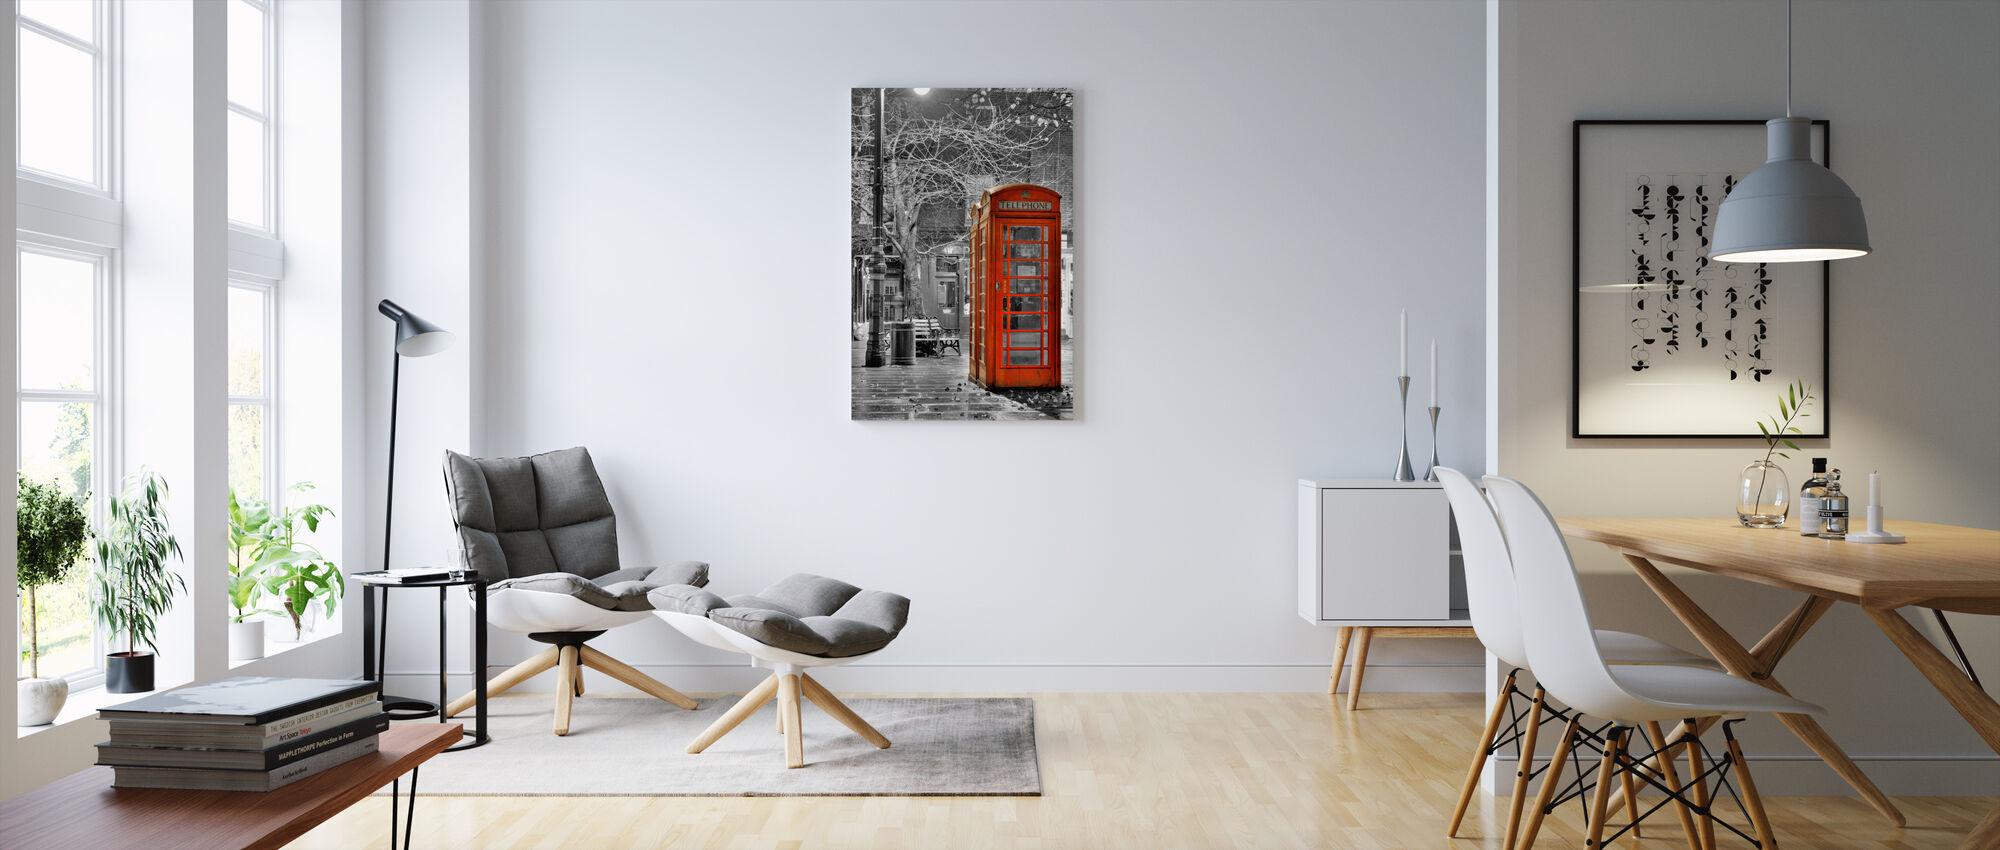 London telefon - Lerretsbilde - Stue